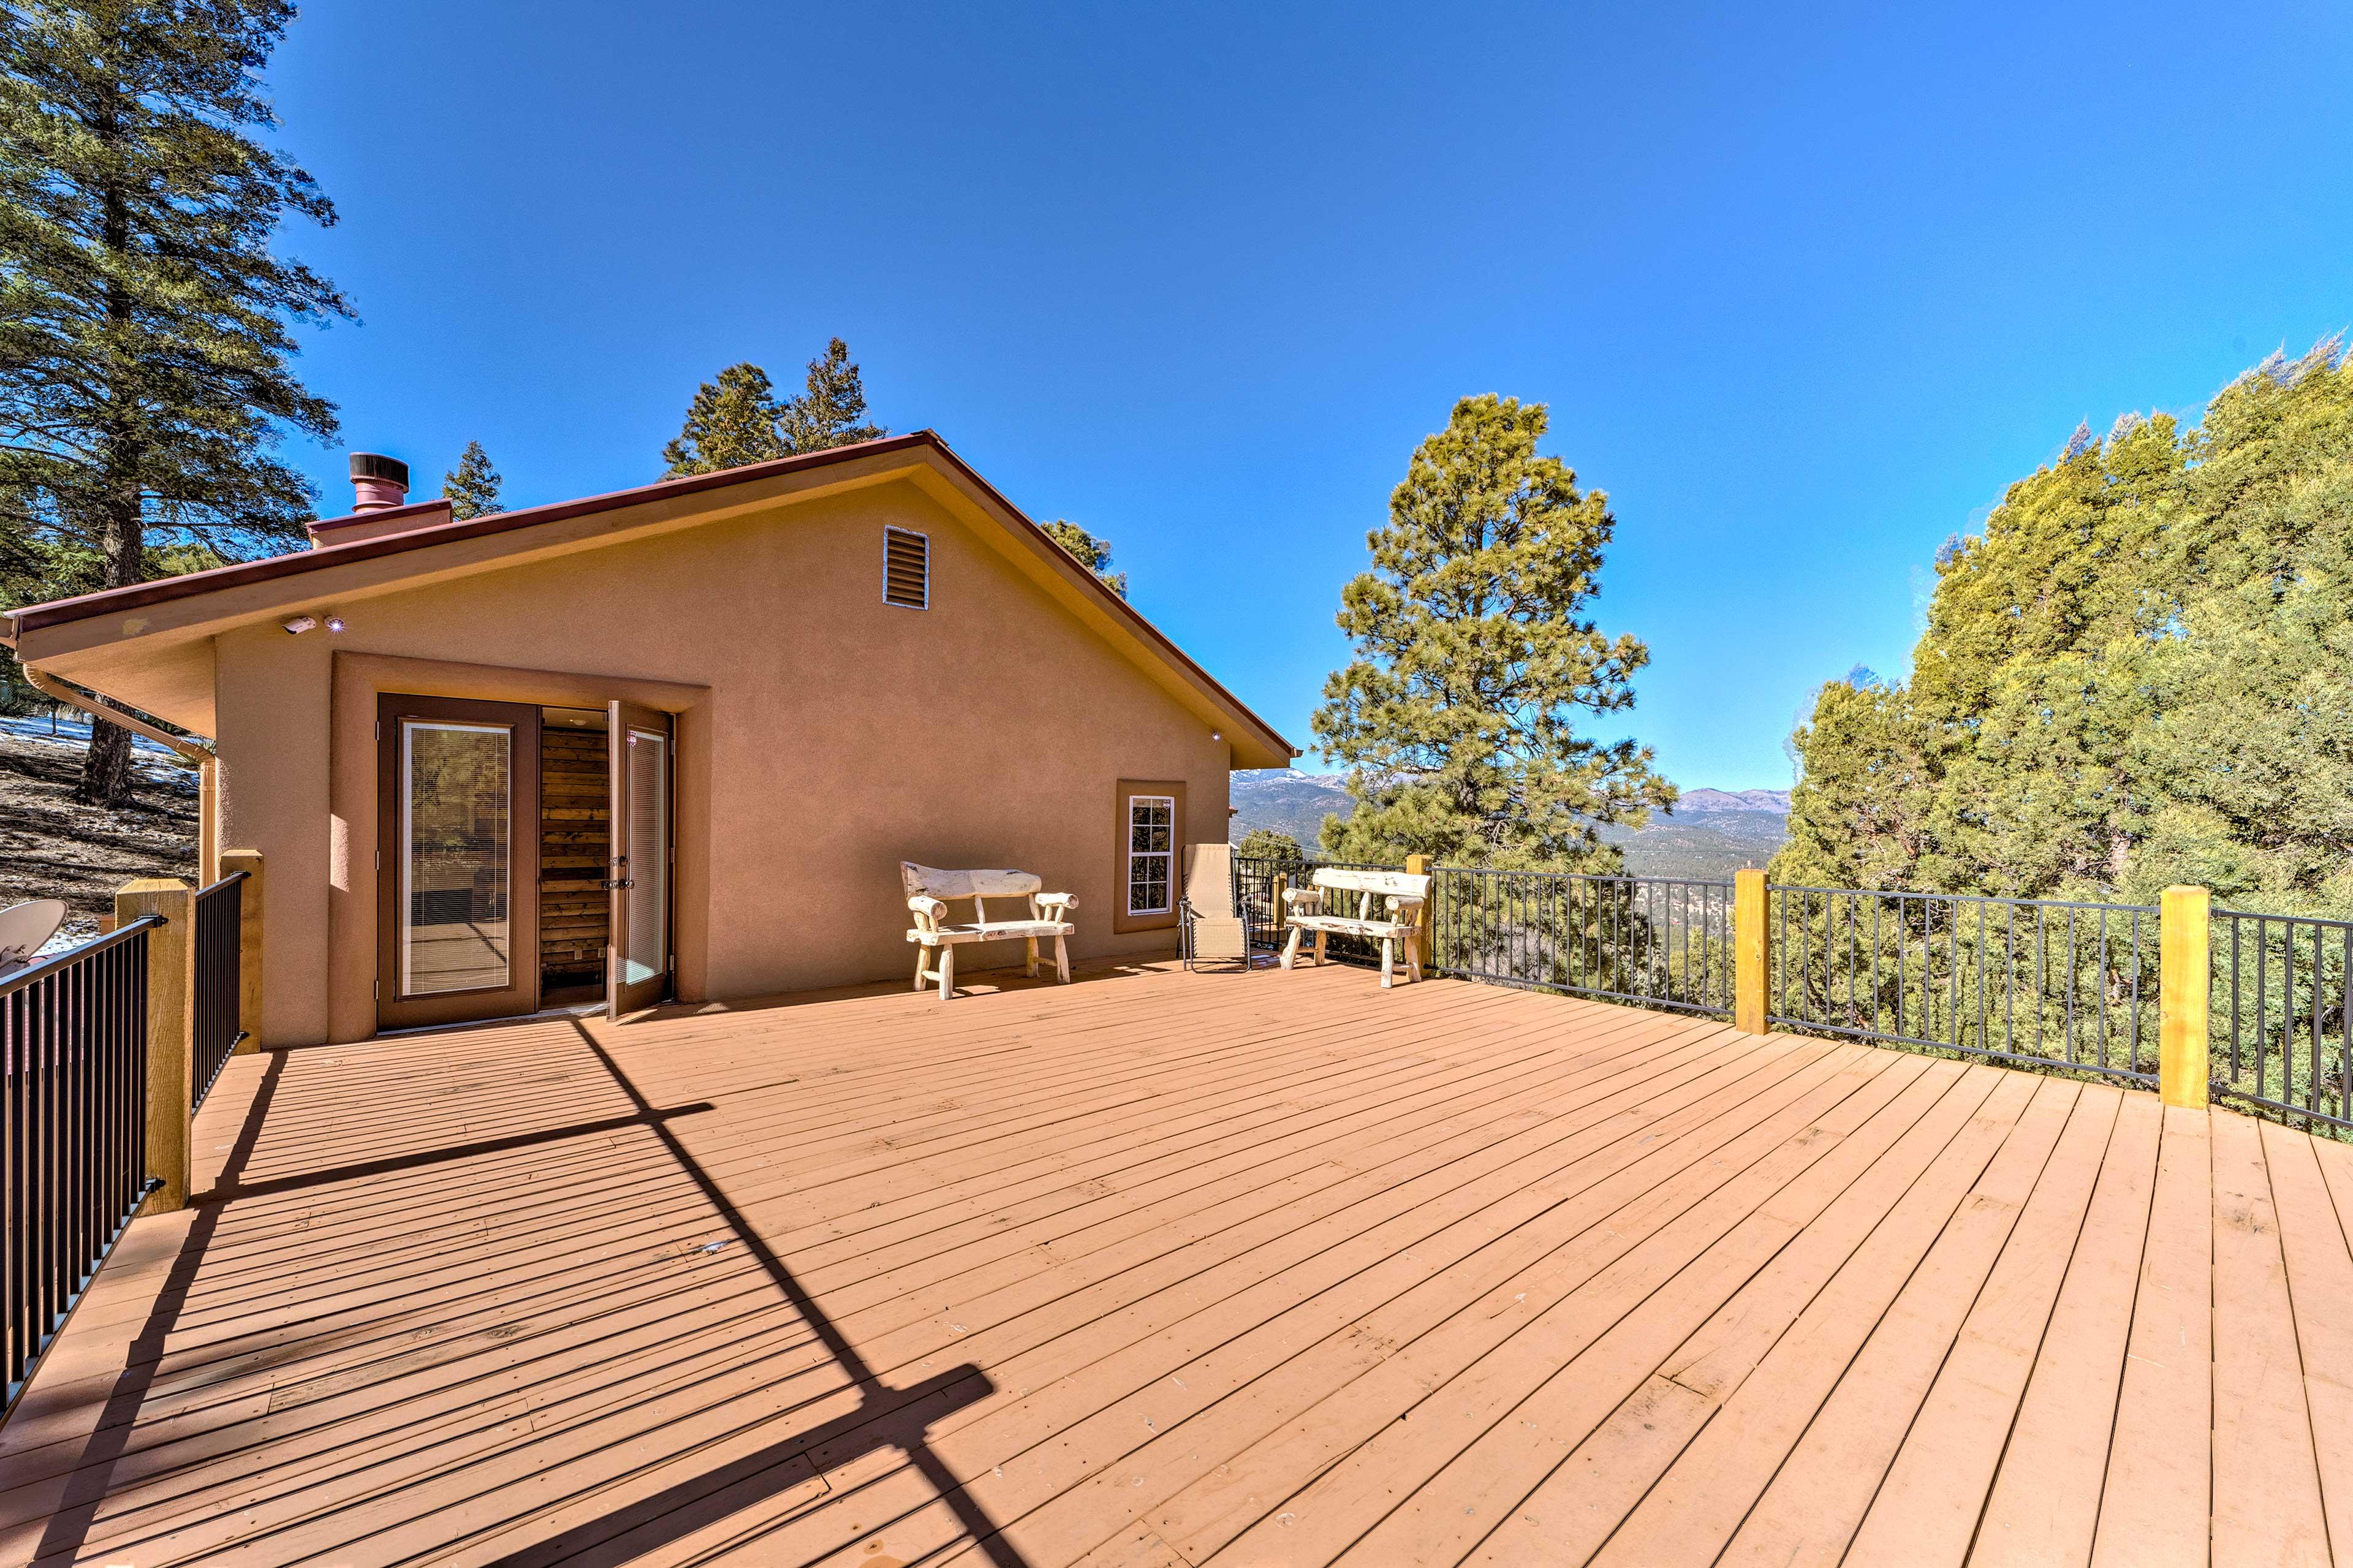 Soak up the Southwestern sun on this spacious deck.